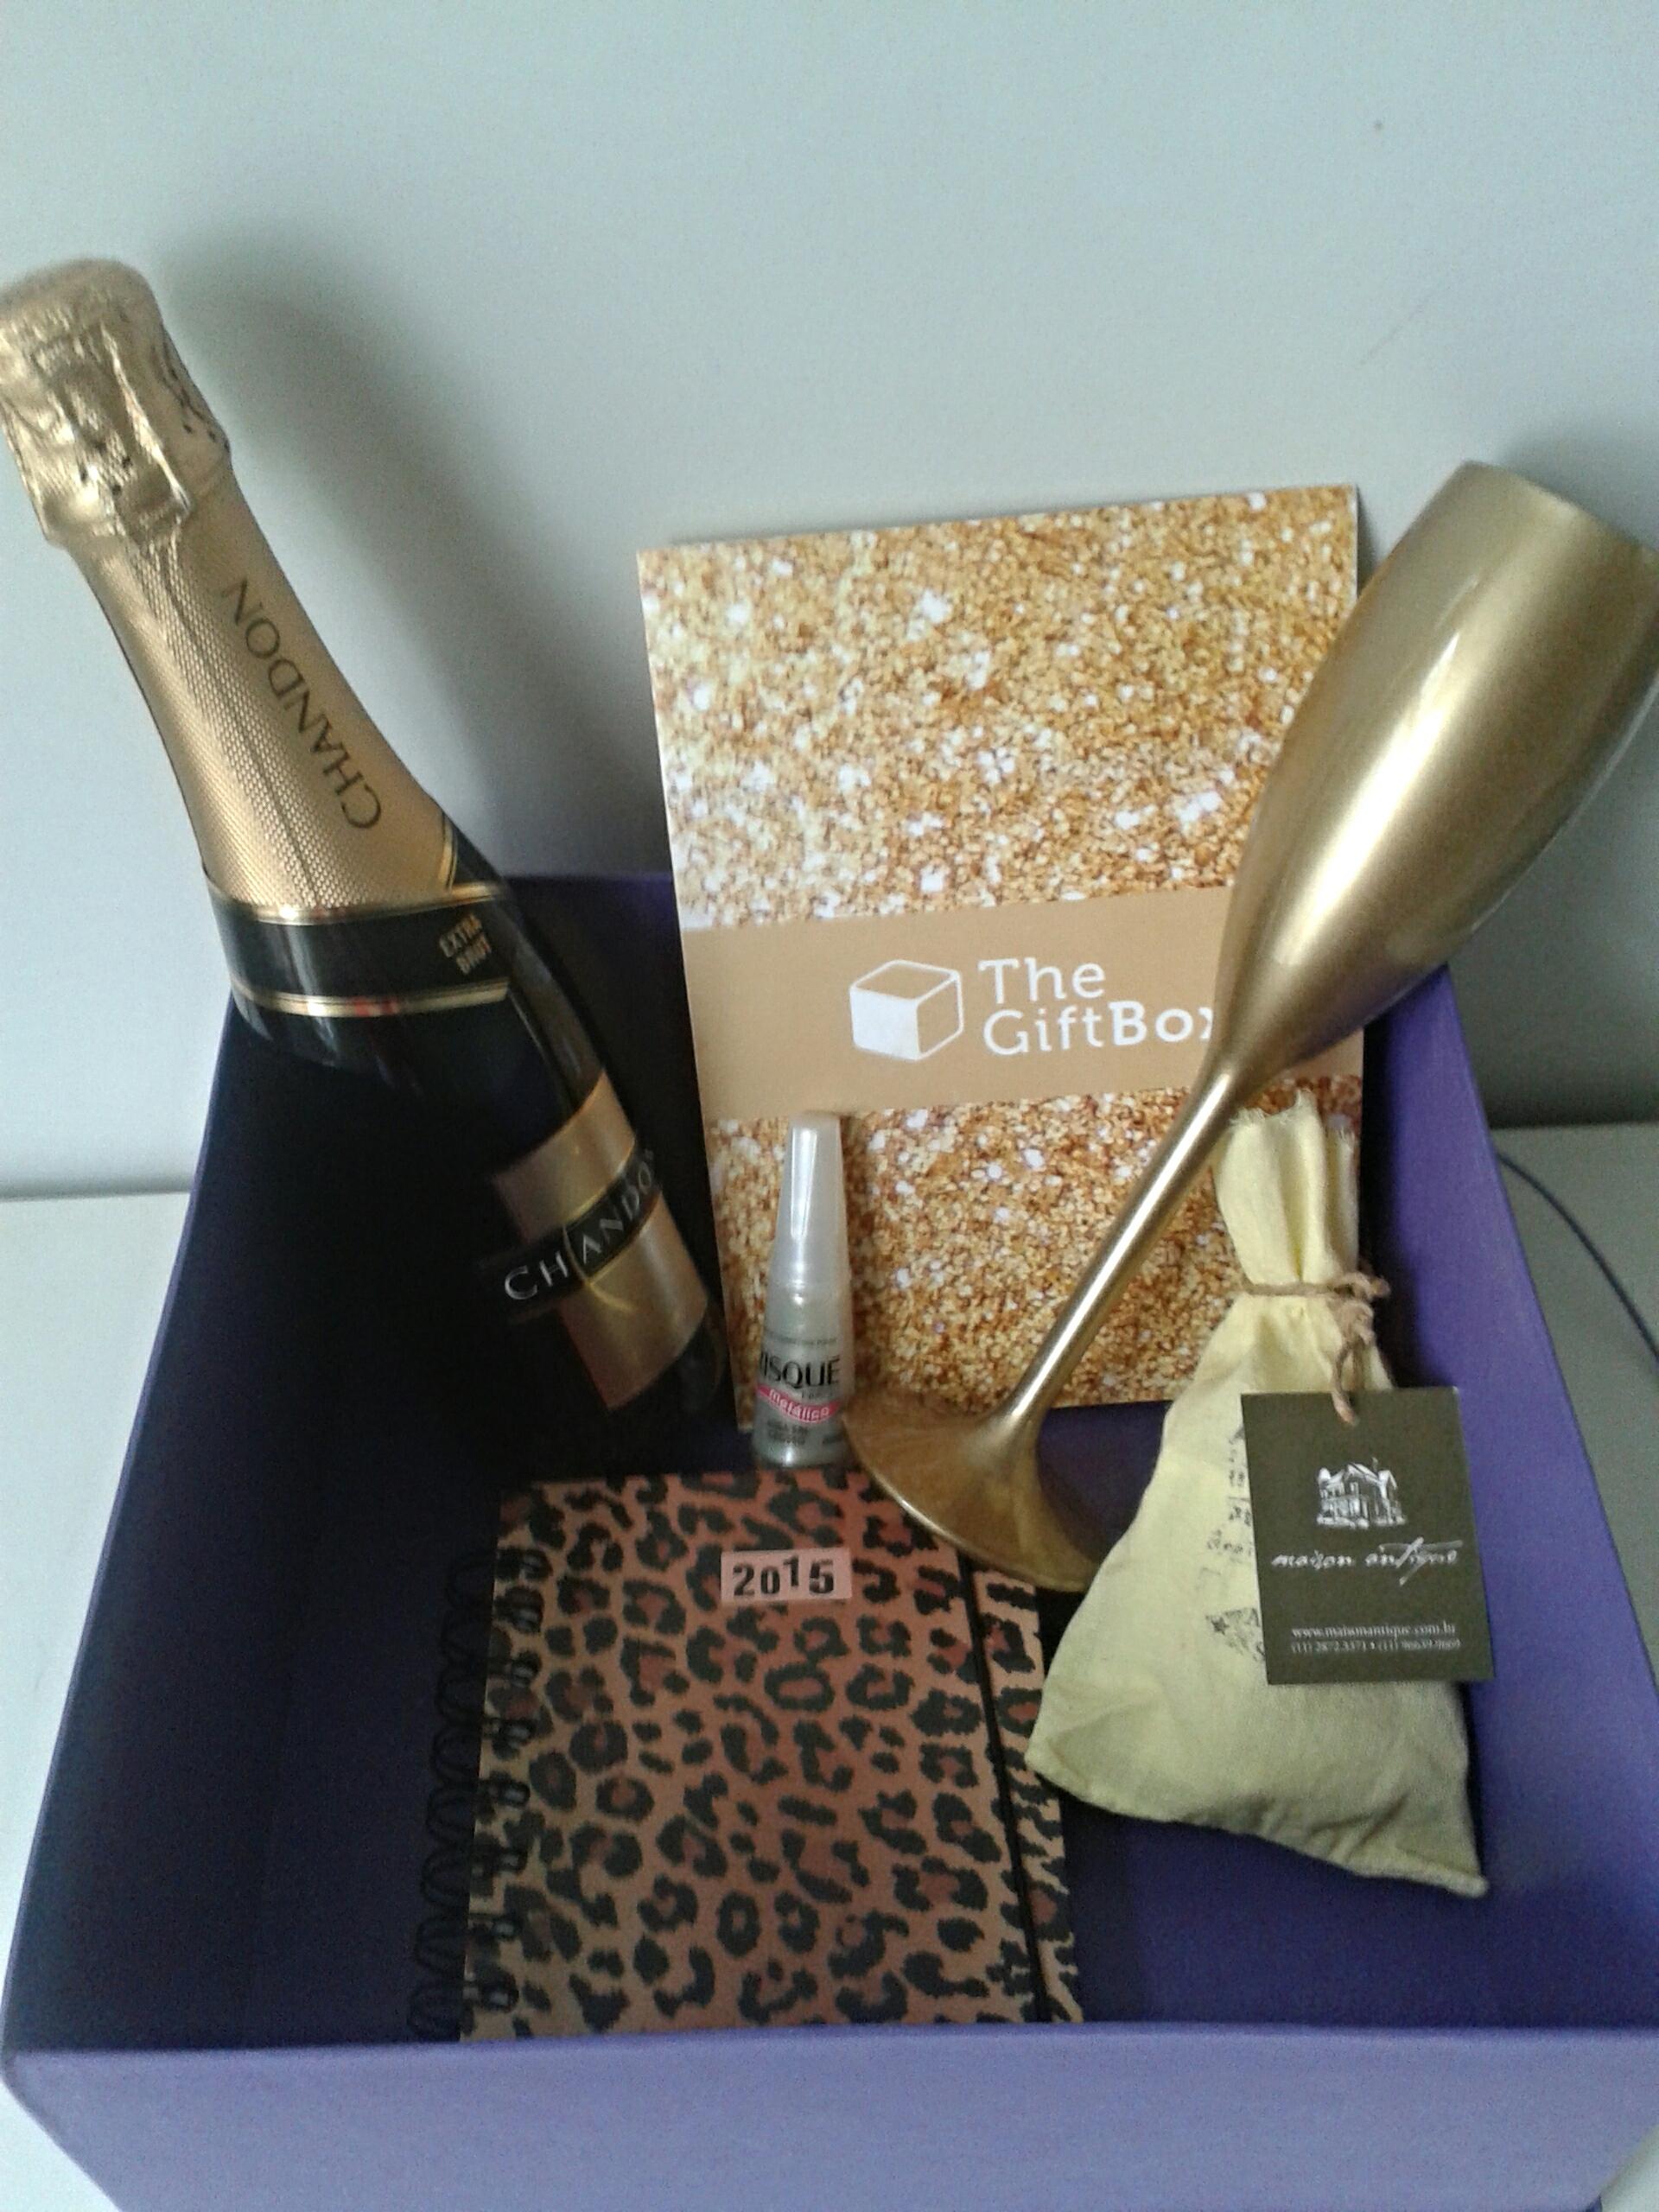 The Gift Box - justsingit.com